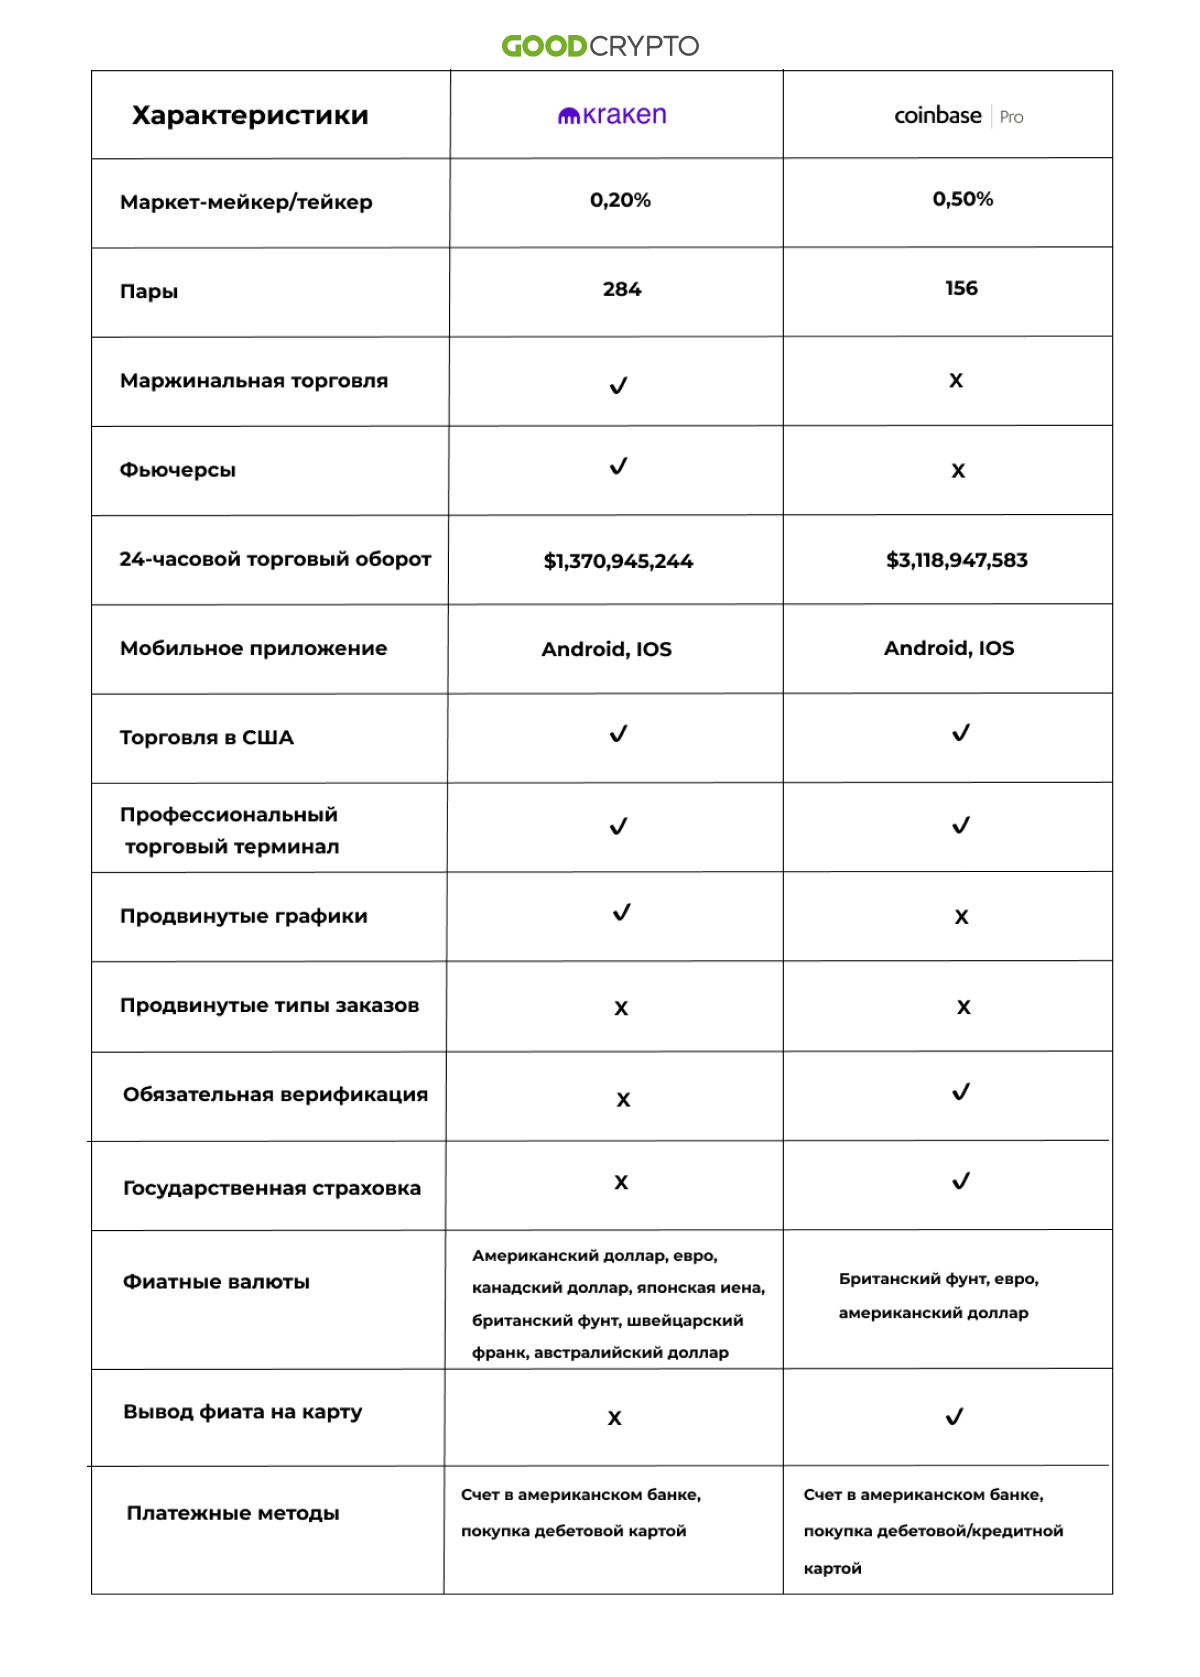 Кракен и Coinbase Pro: сравнительная таблица